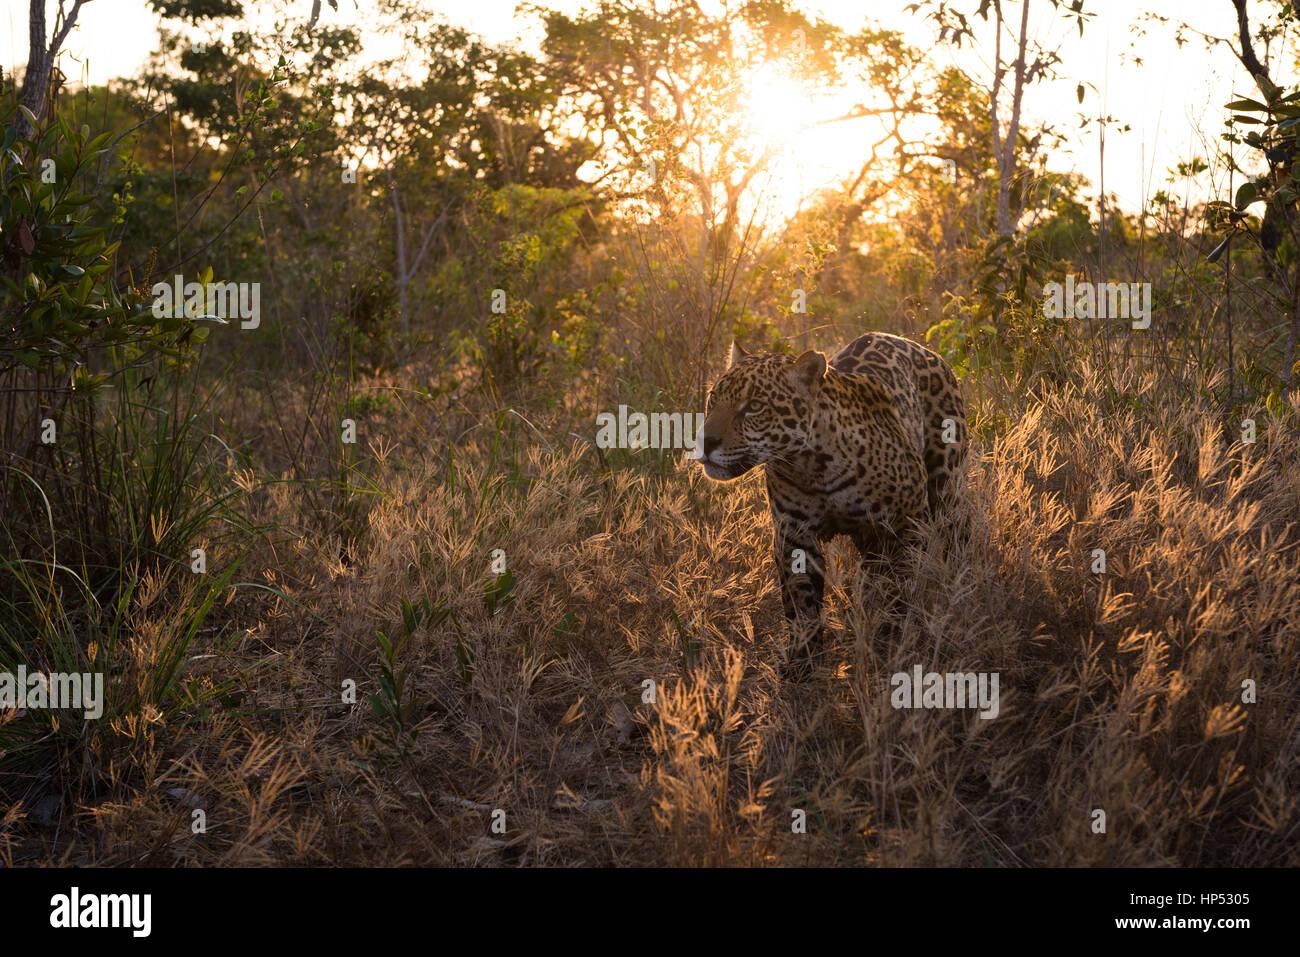 Jaguar exploring the Cerrado Stock Photo